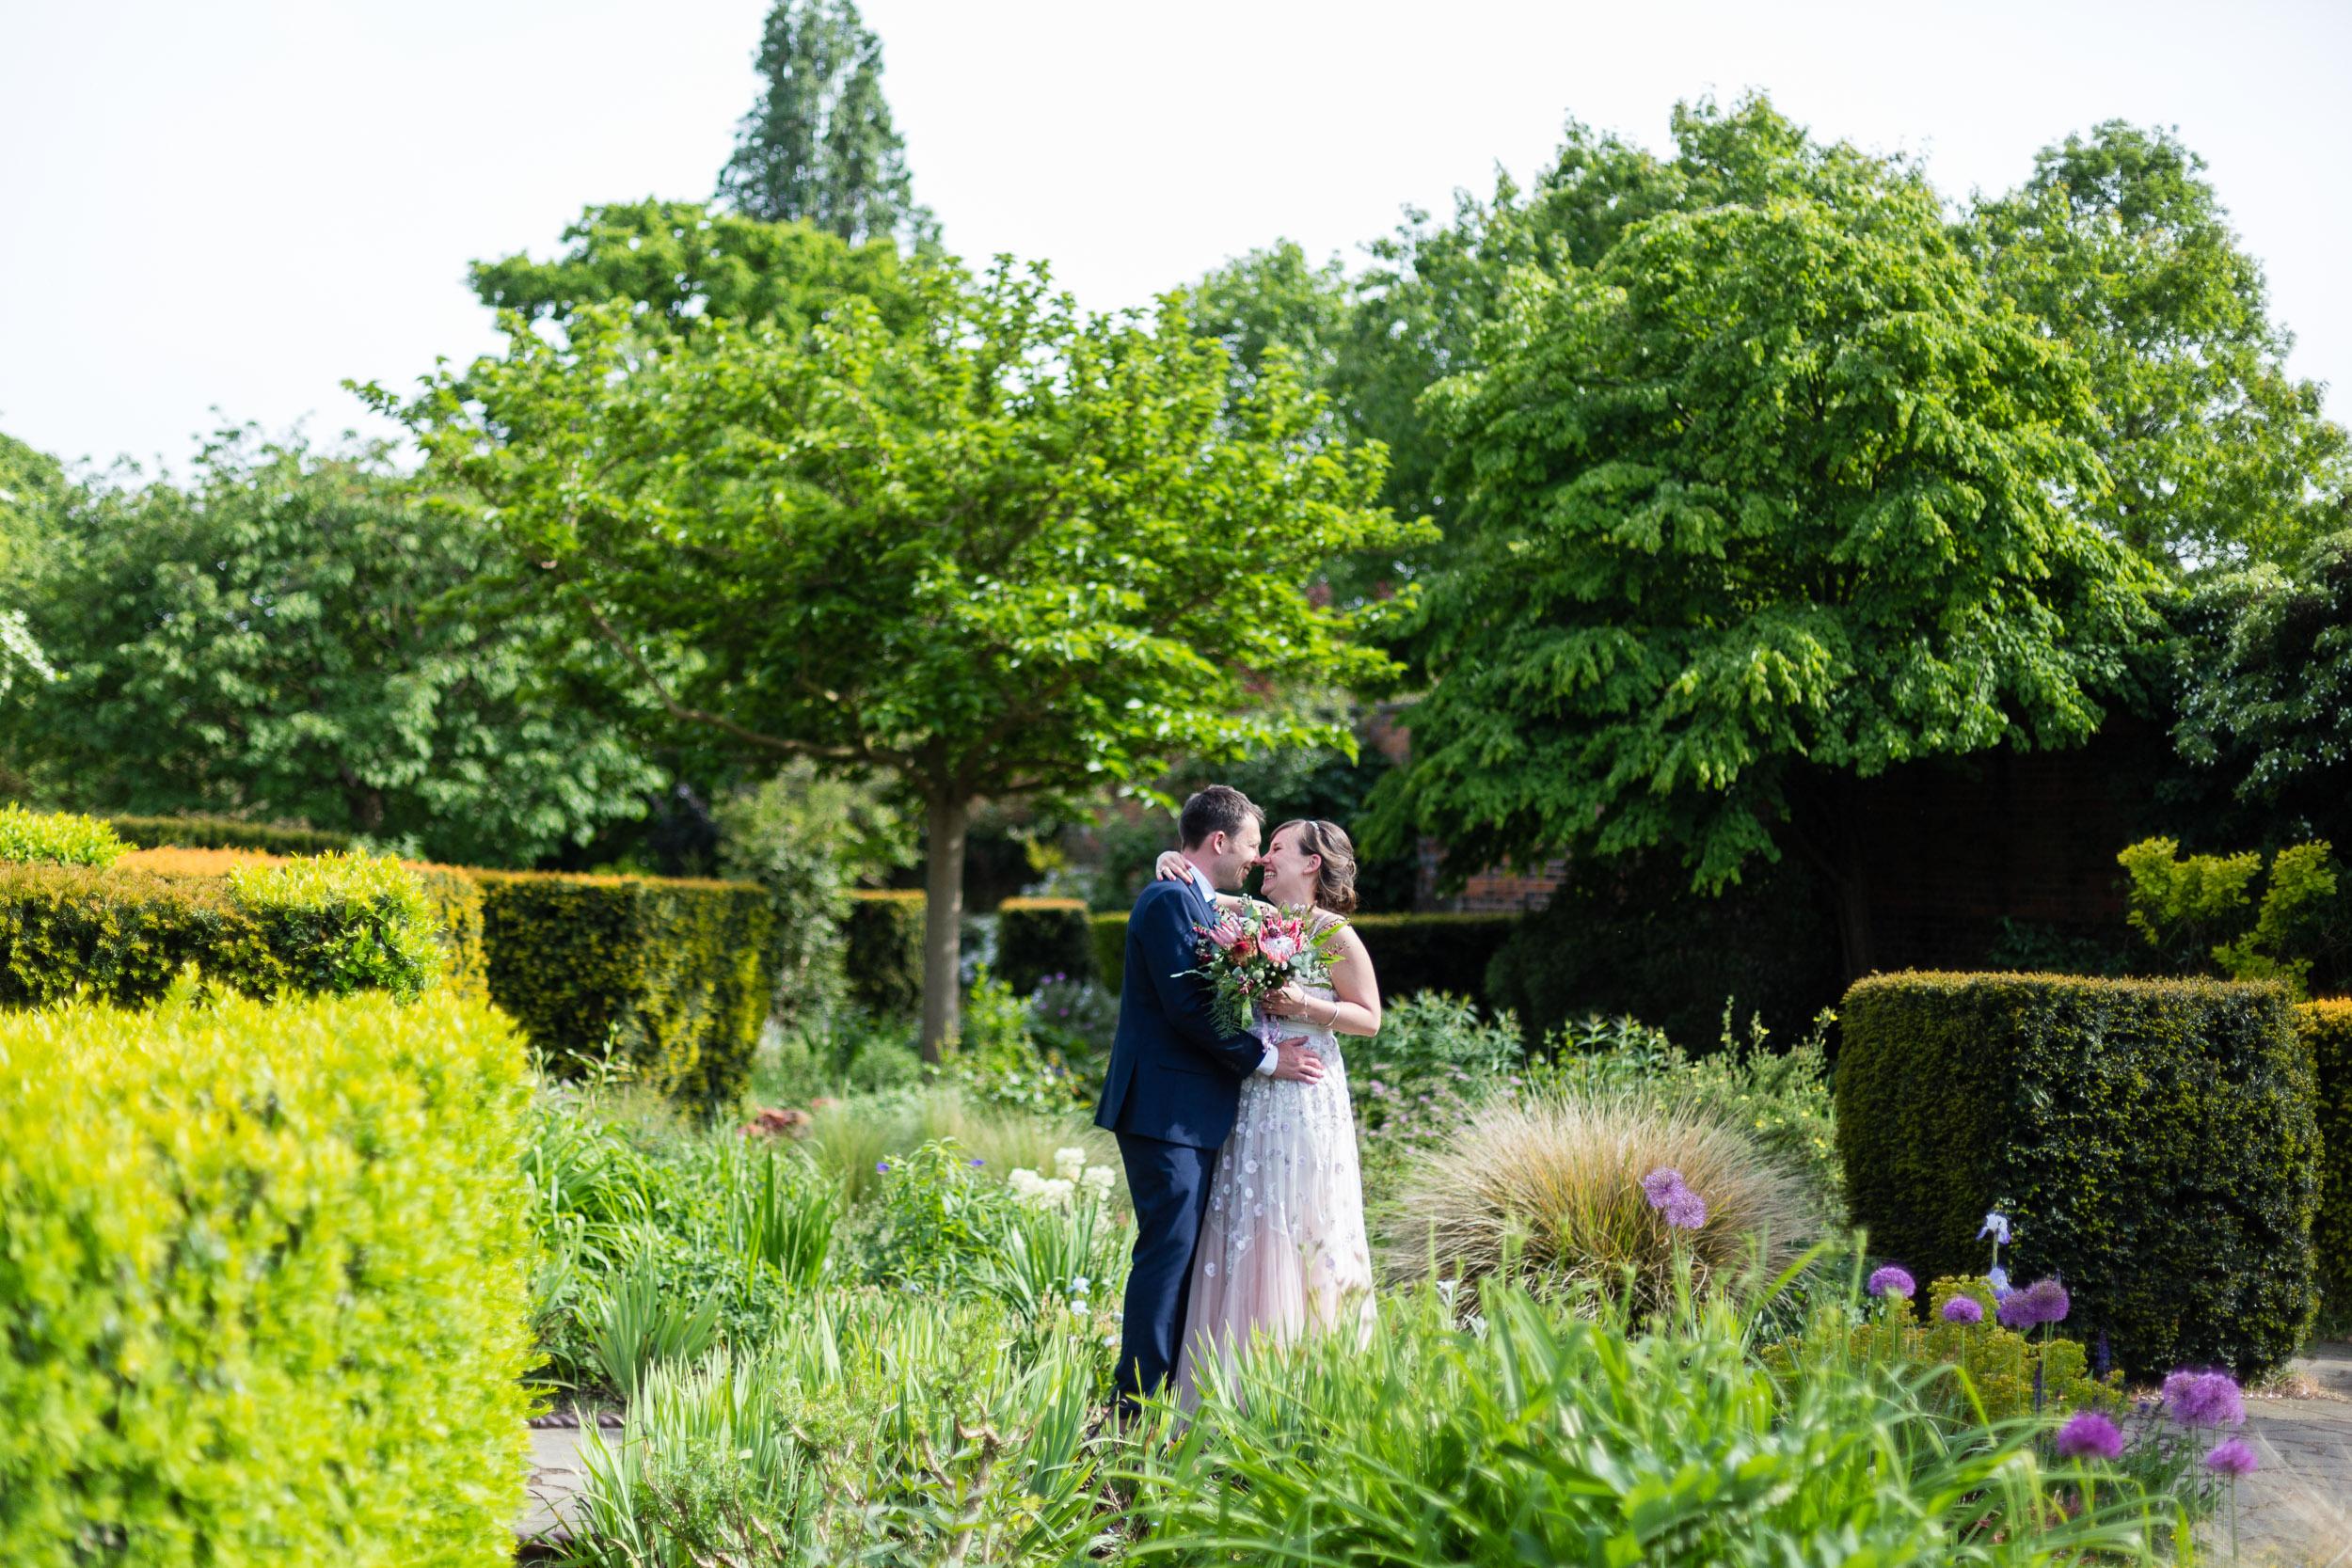 brockwell-lido-brixton-herne-hill-wedding-277.jpg